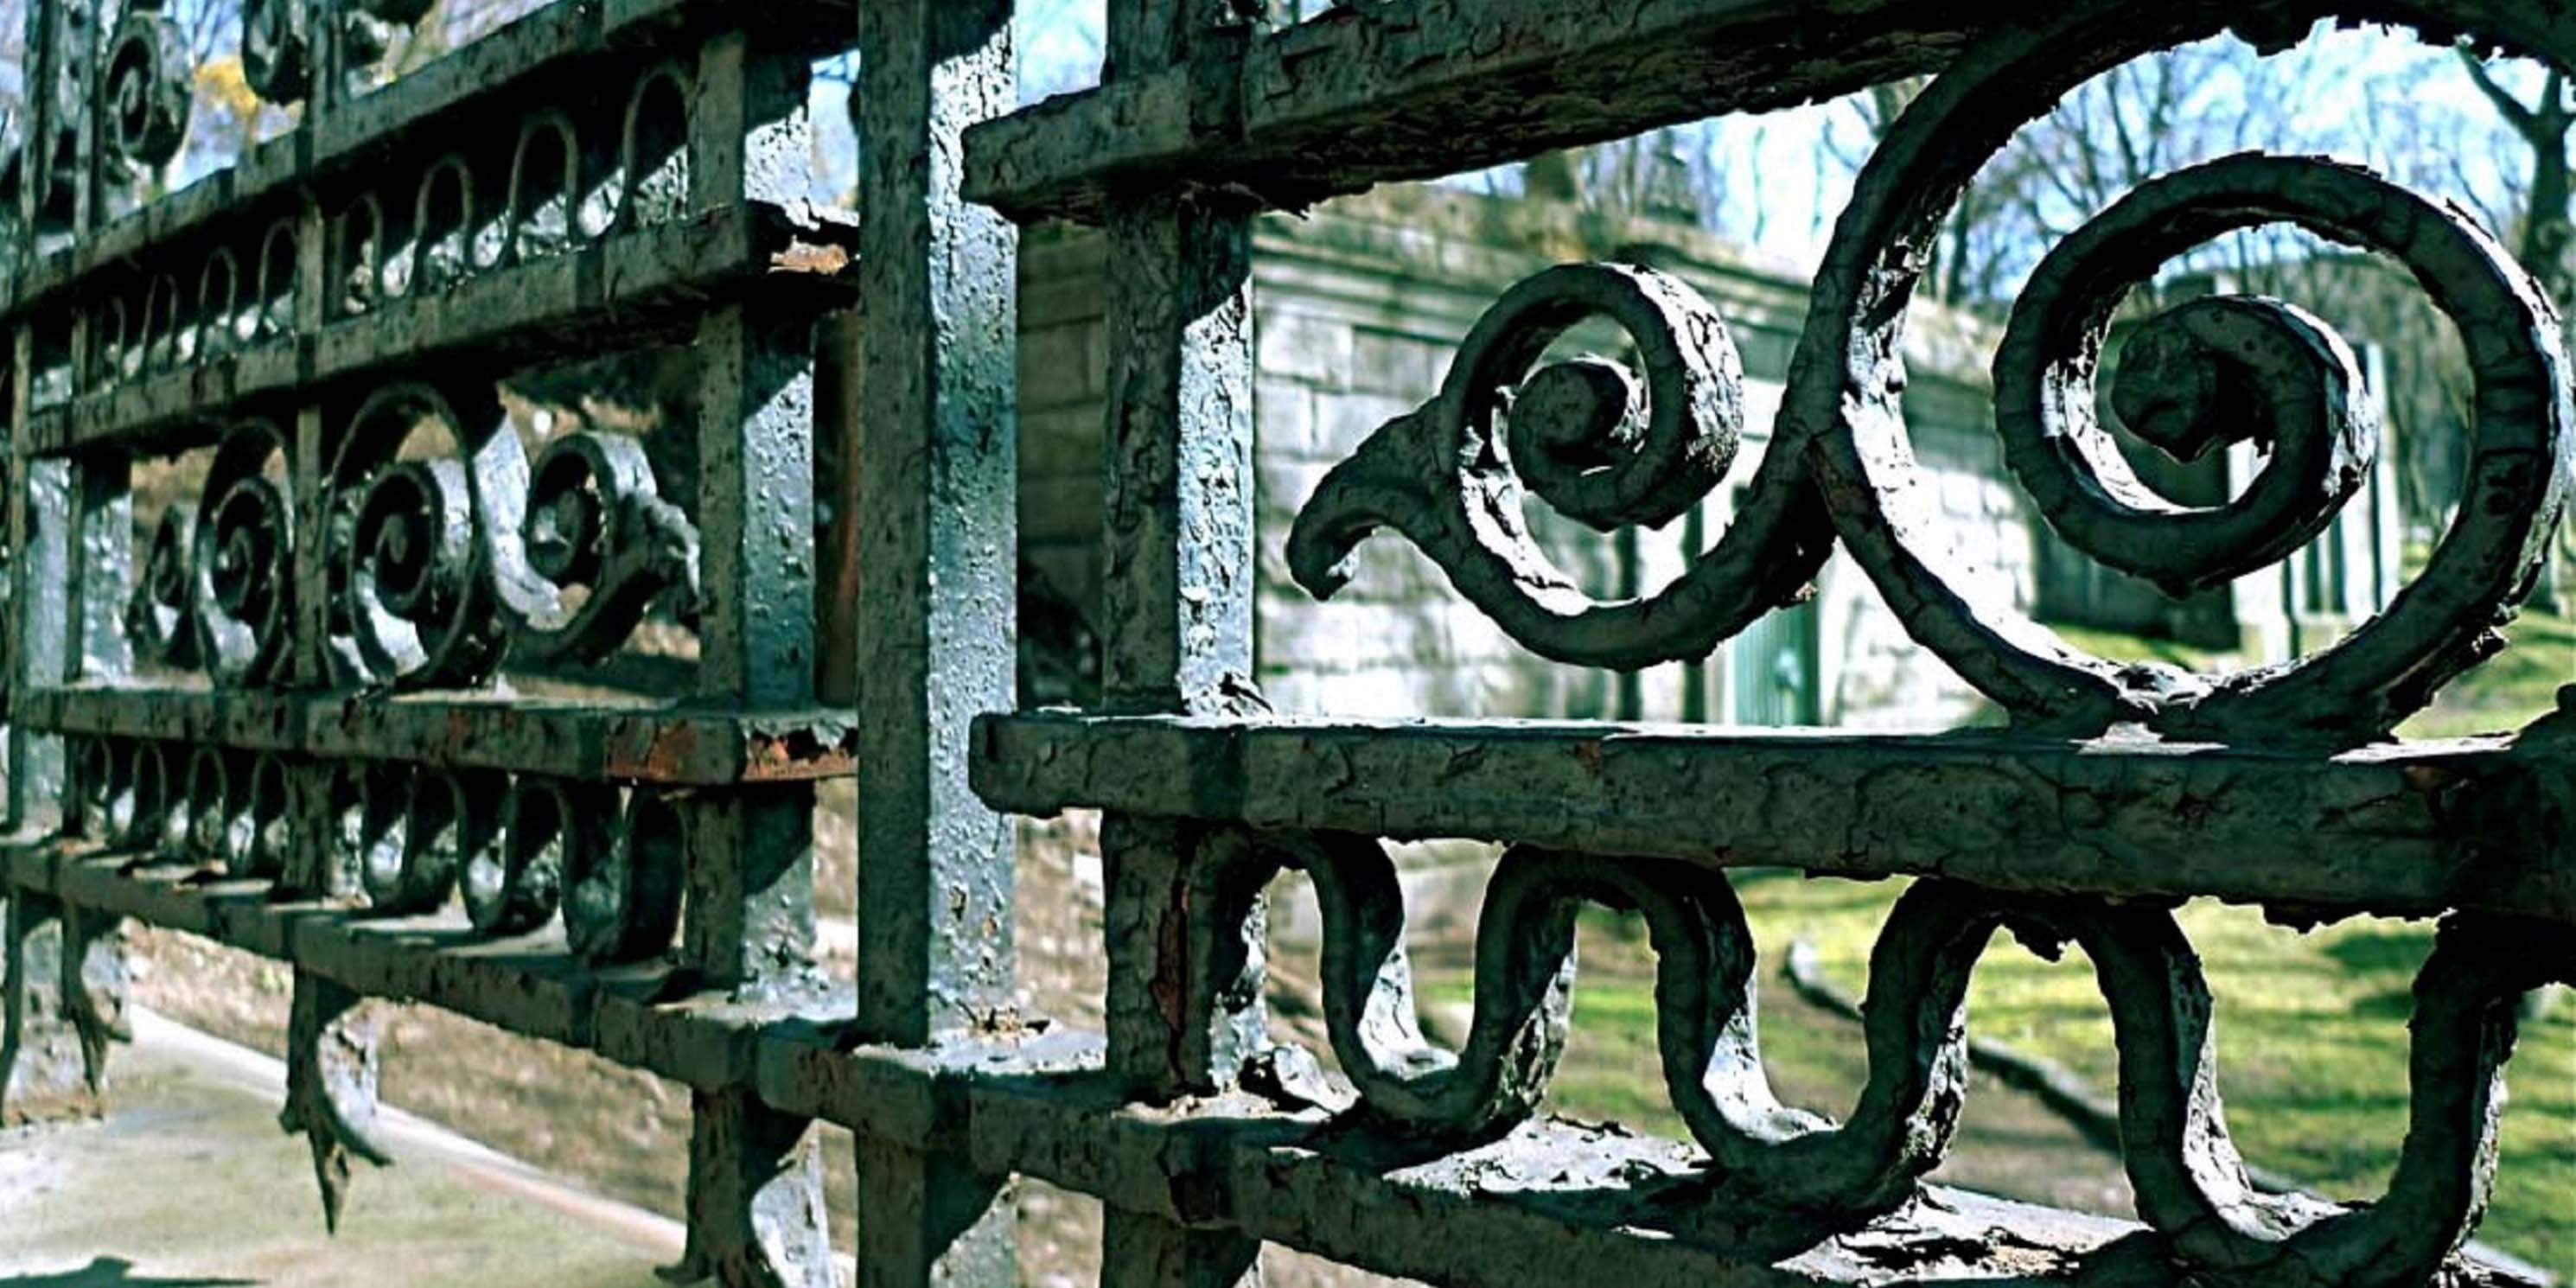 Iron fence at Trinity Church Cemetery